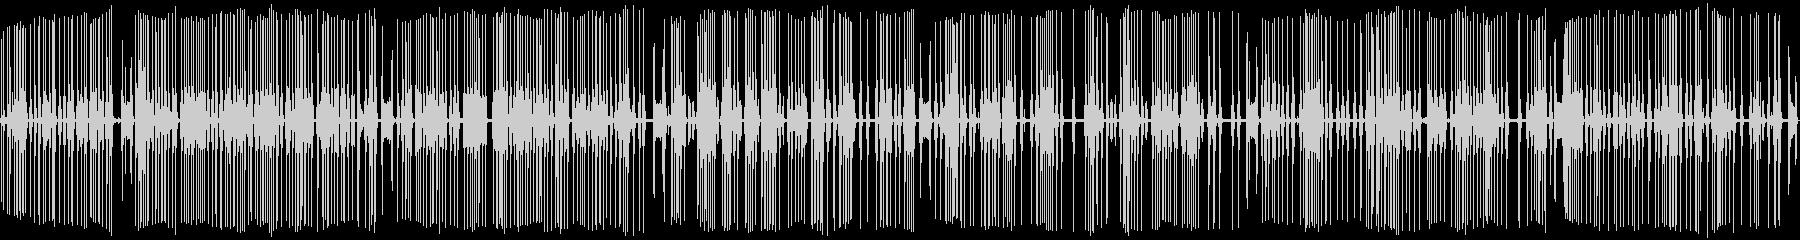 1970S ELECTRIC:迅速...の未再生の波形